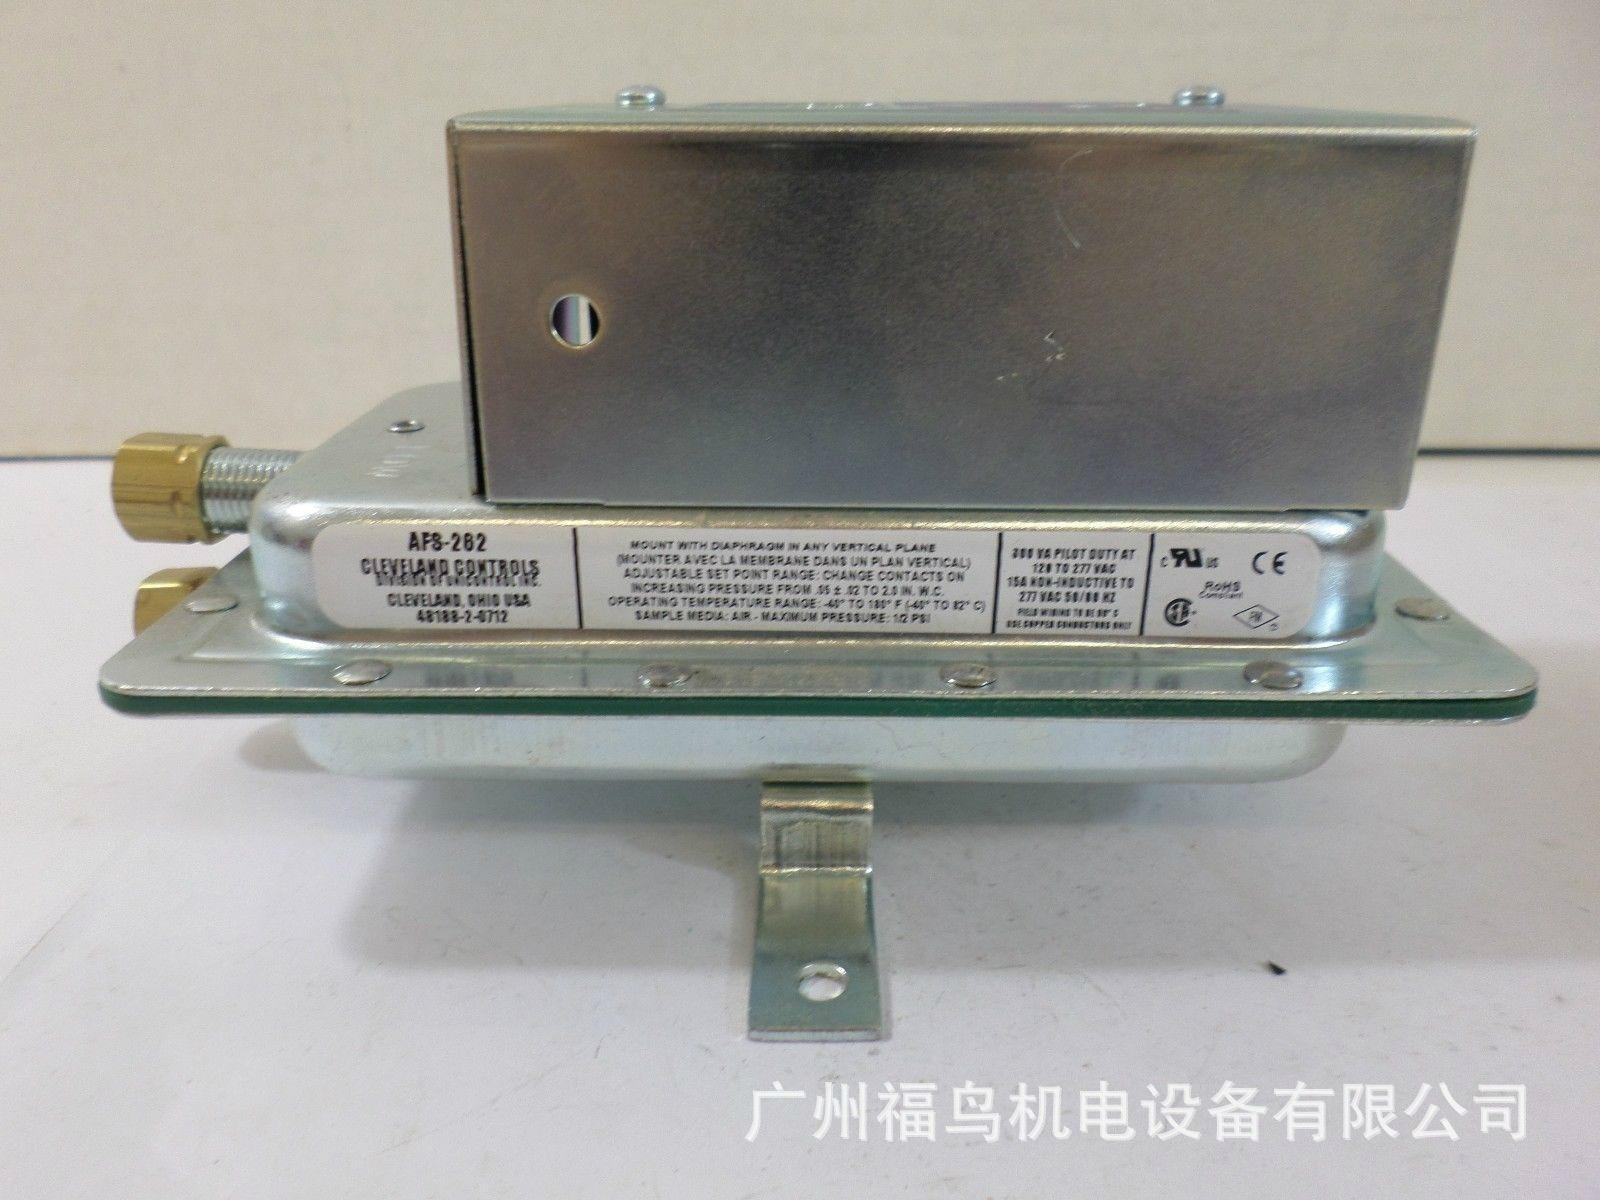 CLEVELAND CONTROLS压力开关, 型号: AFS-262